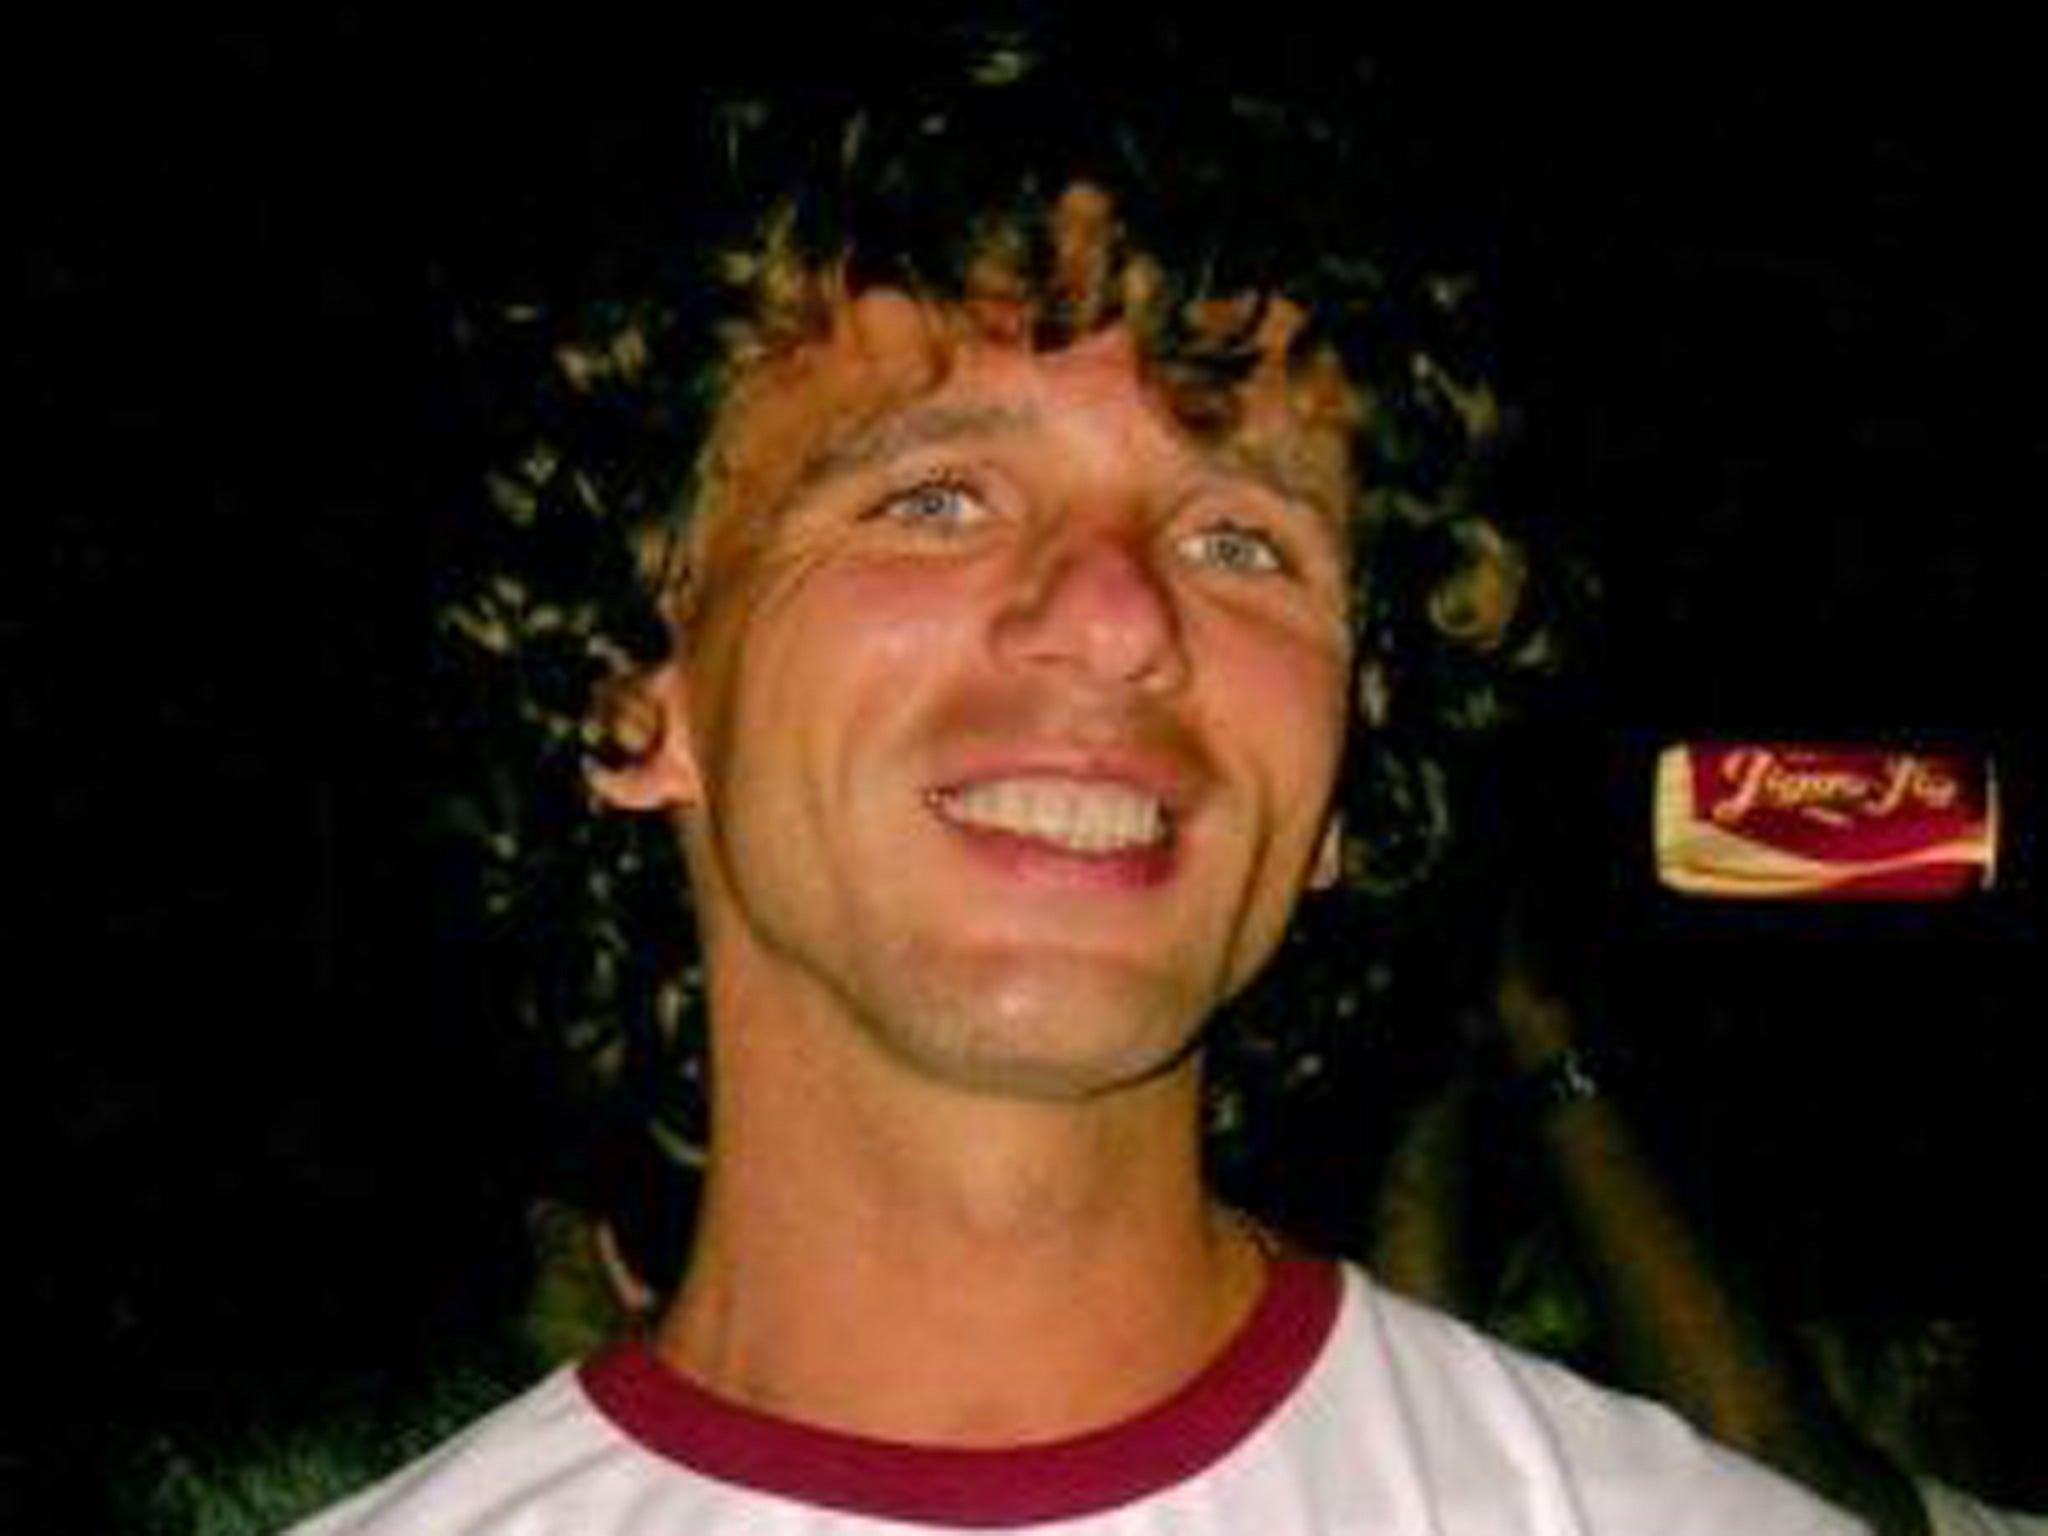 Fresh doubts over Briton Lee <b>Bradley Brown's</b> death in Dubai | Middle East ... - lee-bradley-brown